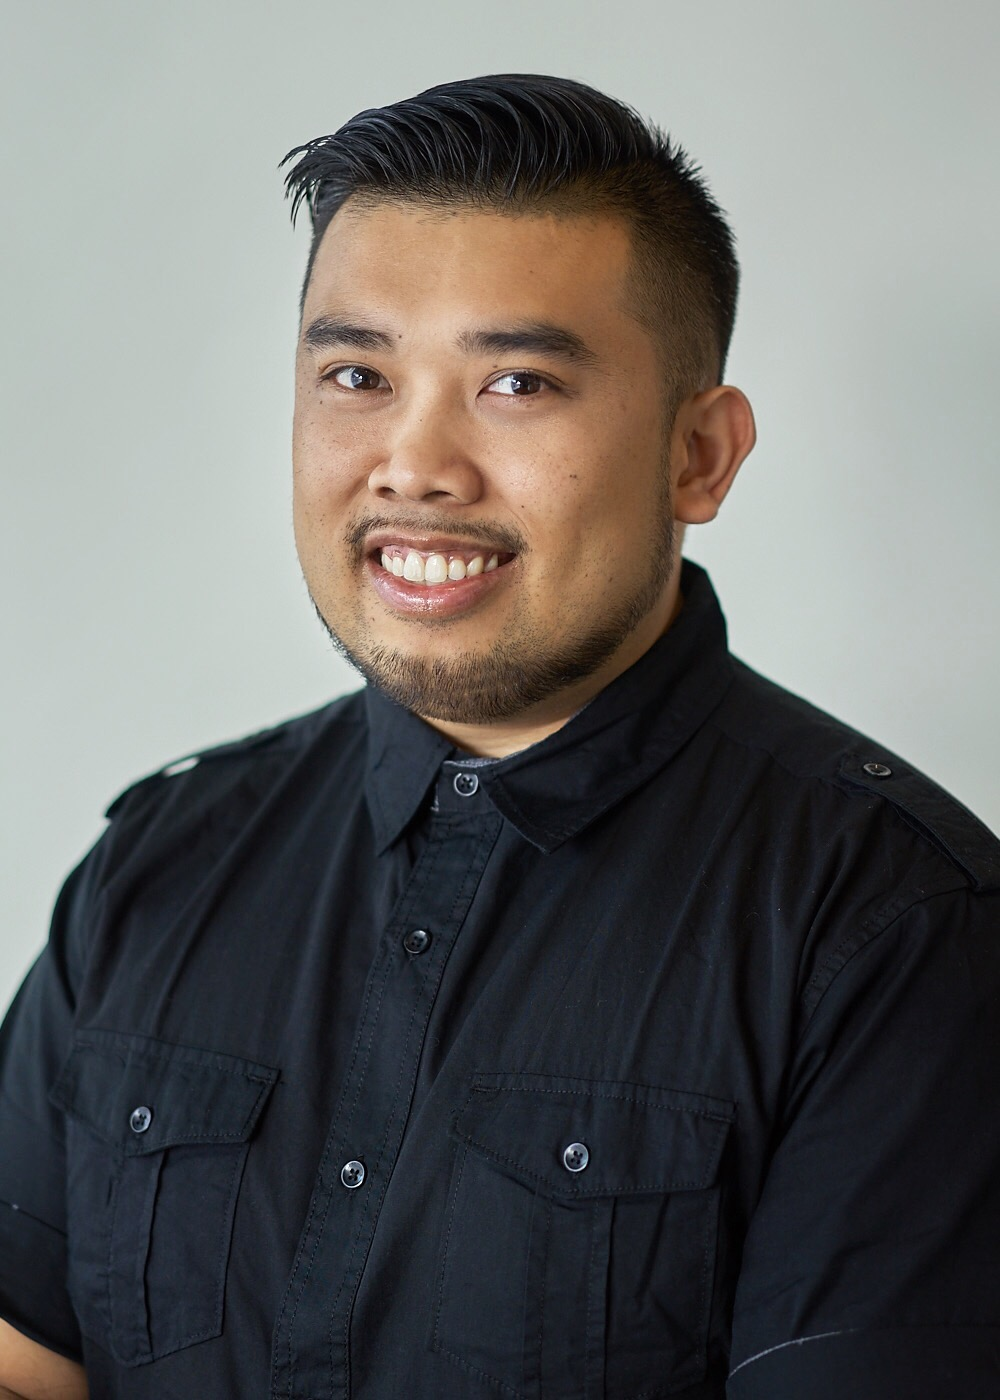 Meet Timothy, a dental hygienist at Tanega Dental in South San Francisco.